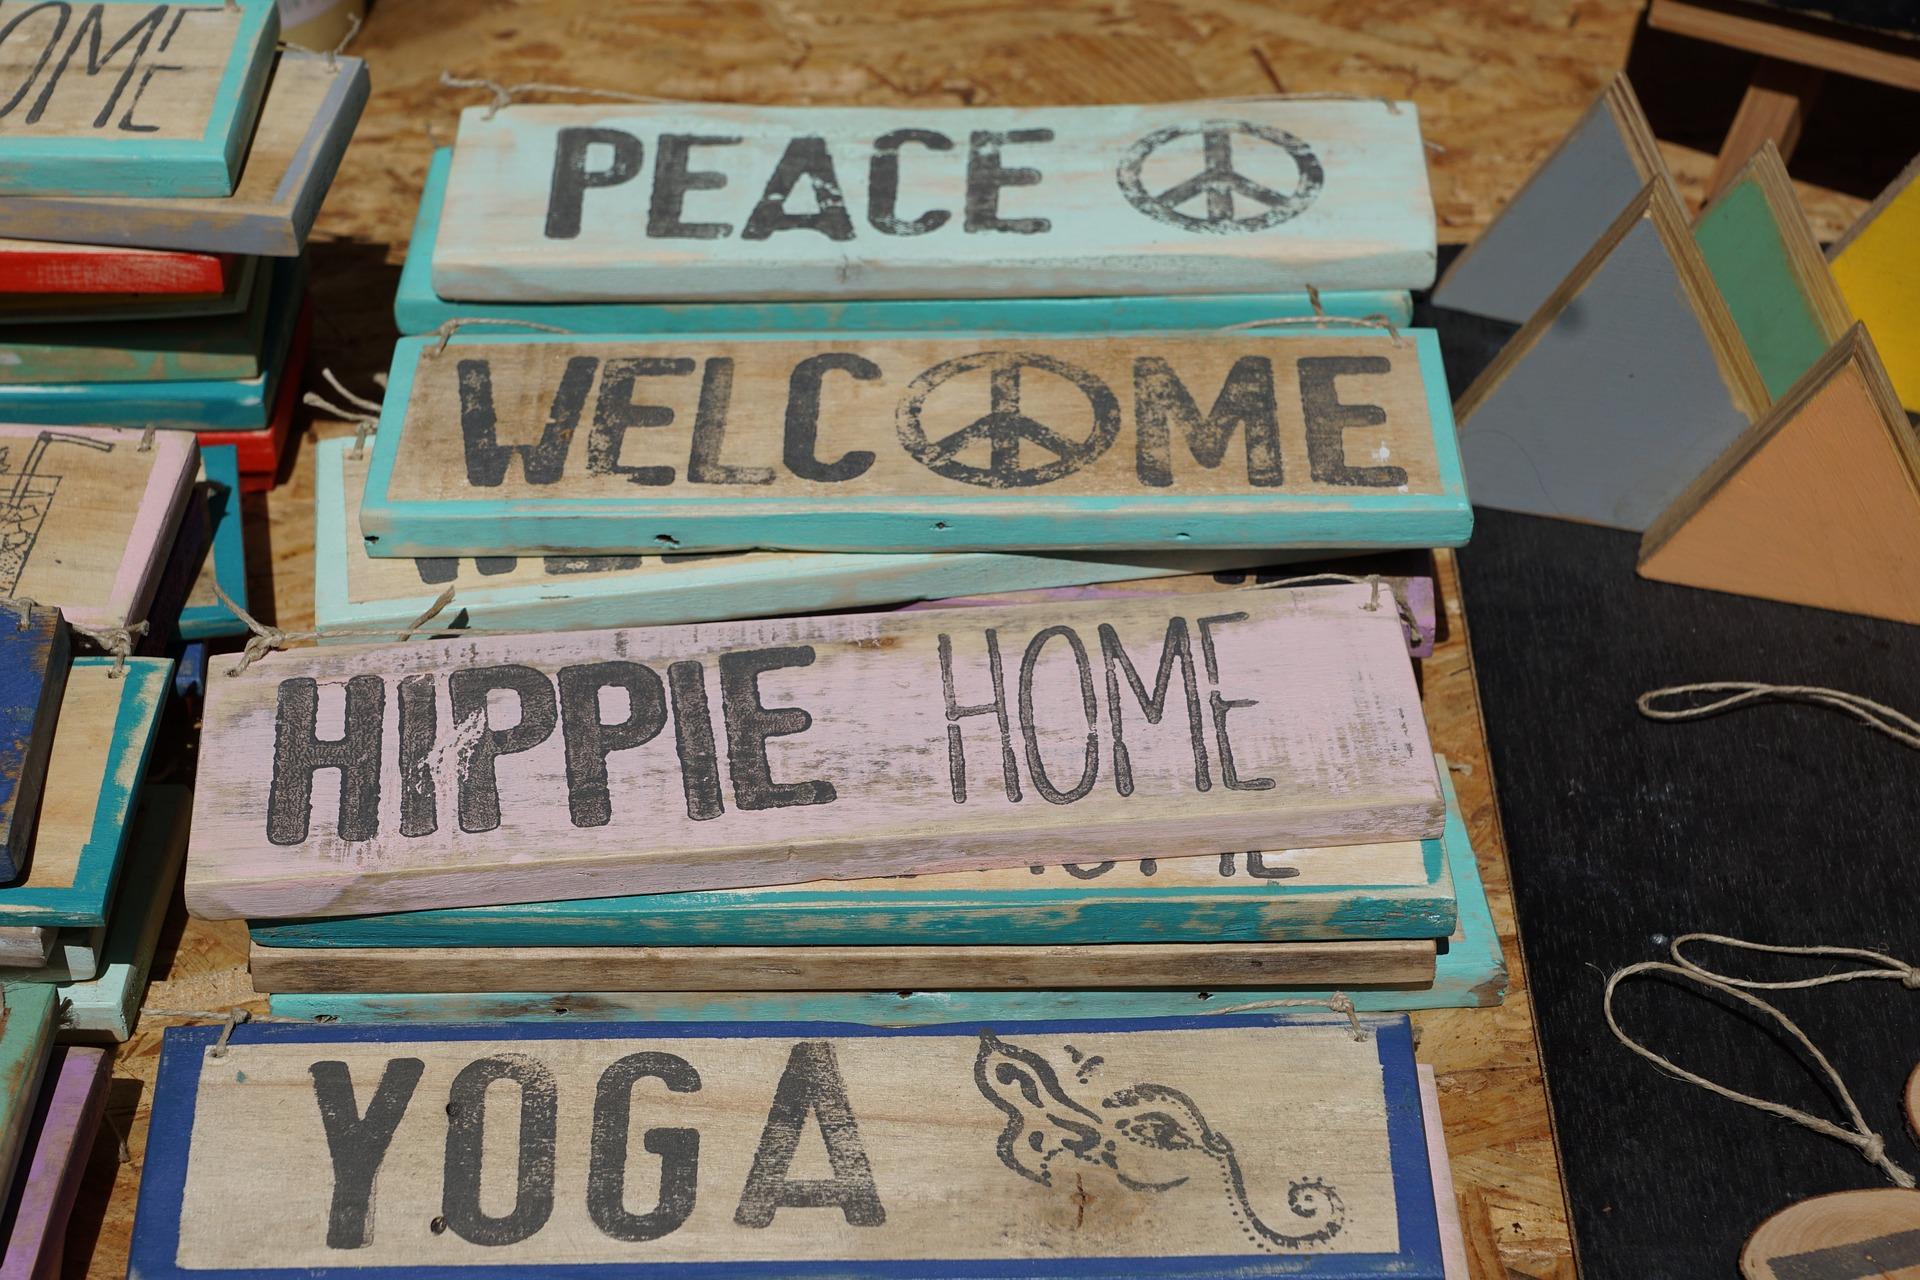 Quarto hippie